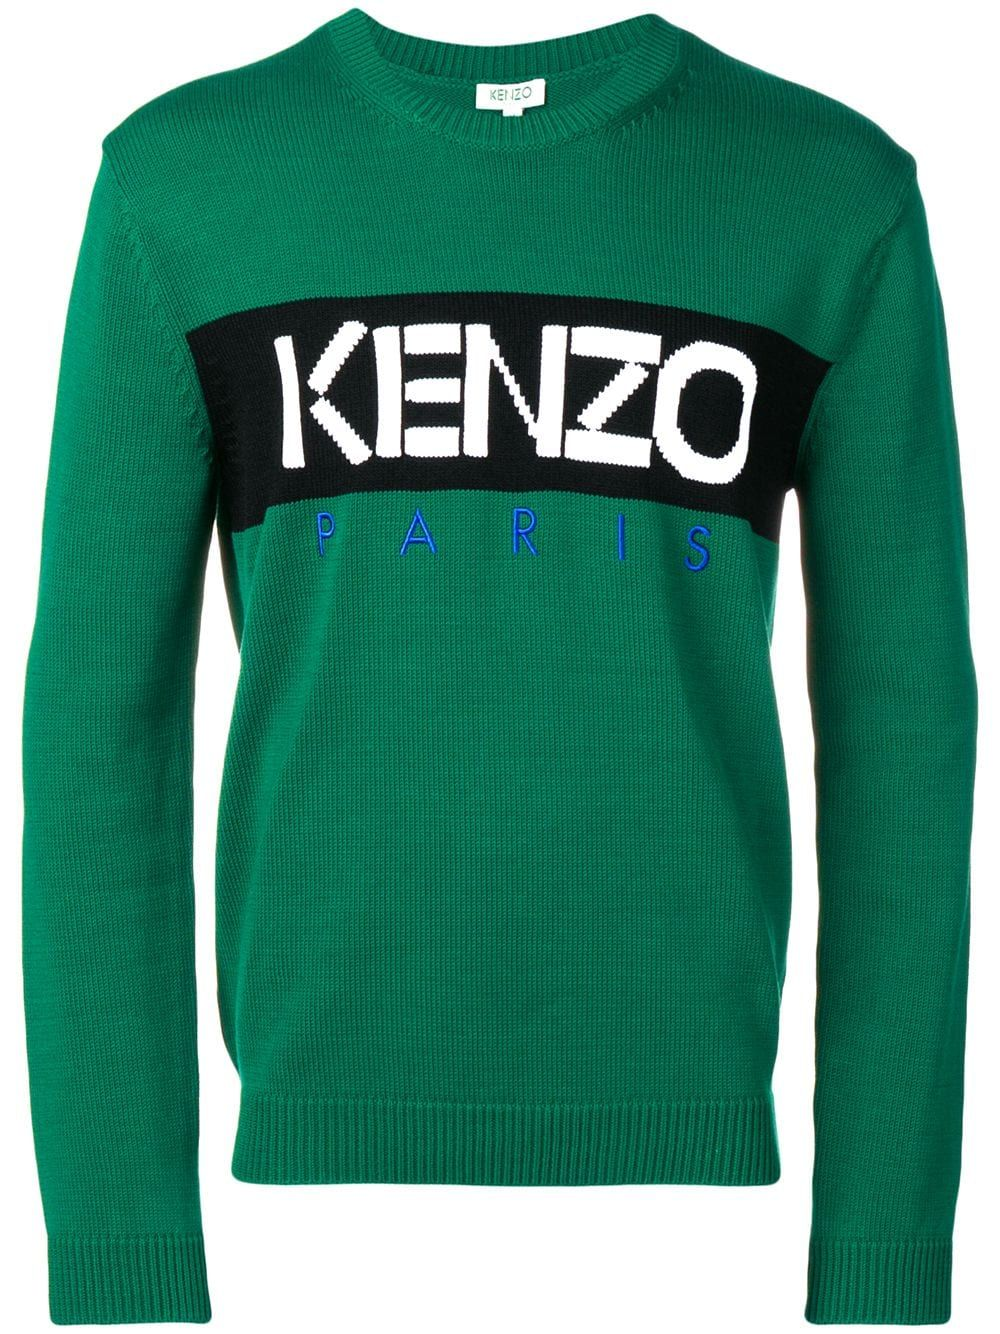 ddca160de KENZO KENZO LOGO SWEATER - GREEN. #kenzo #cloth   Kenzo in 2019 ...